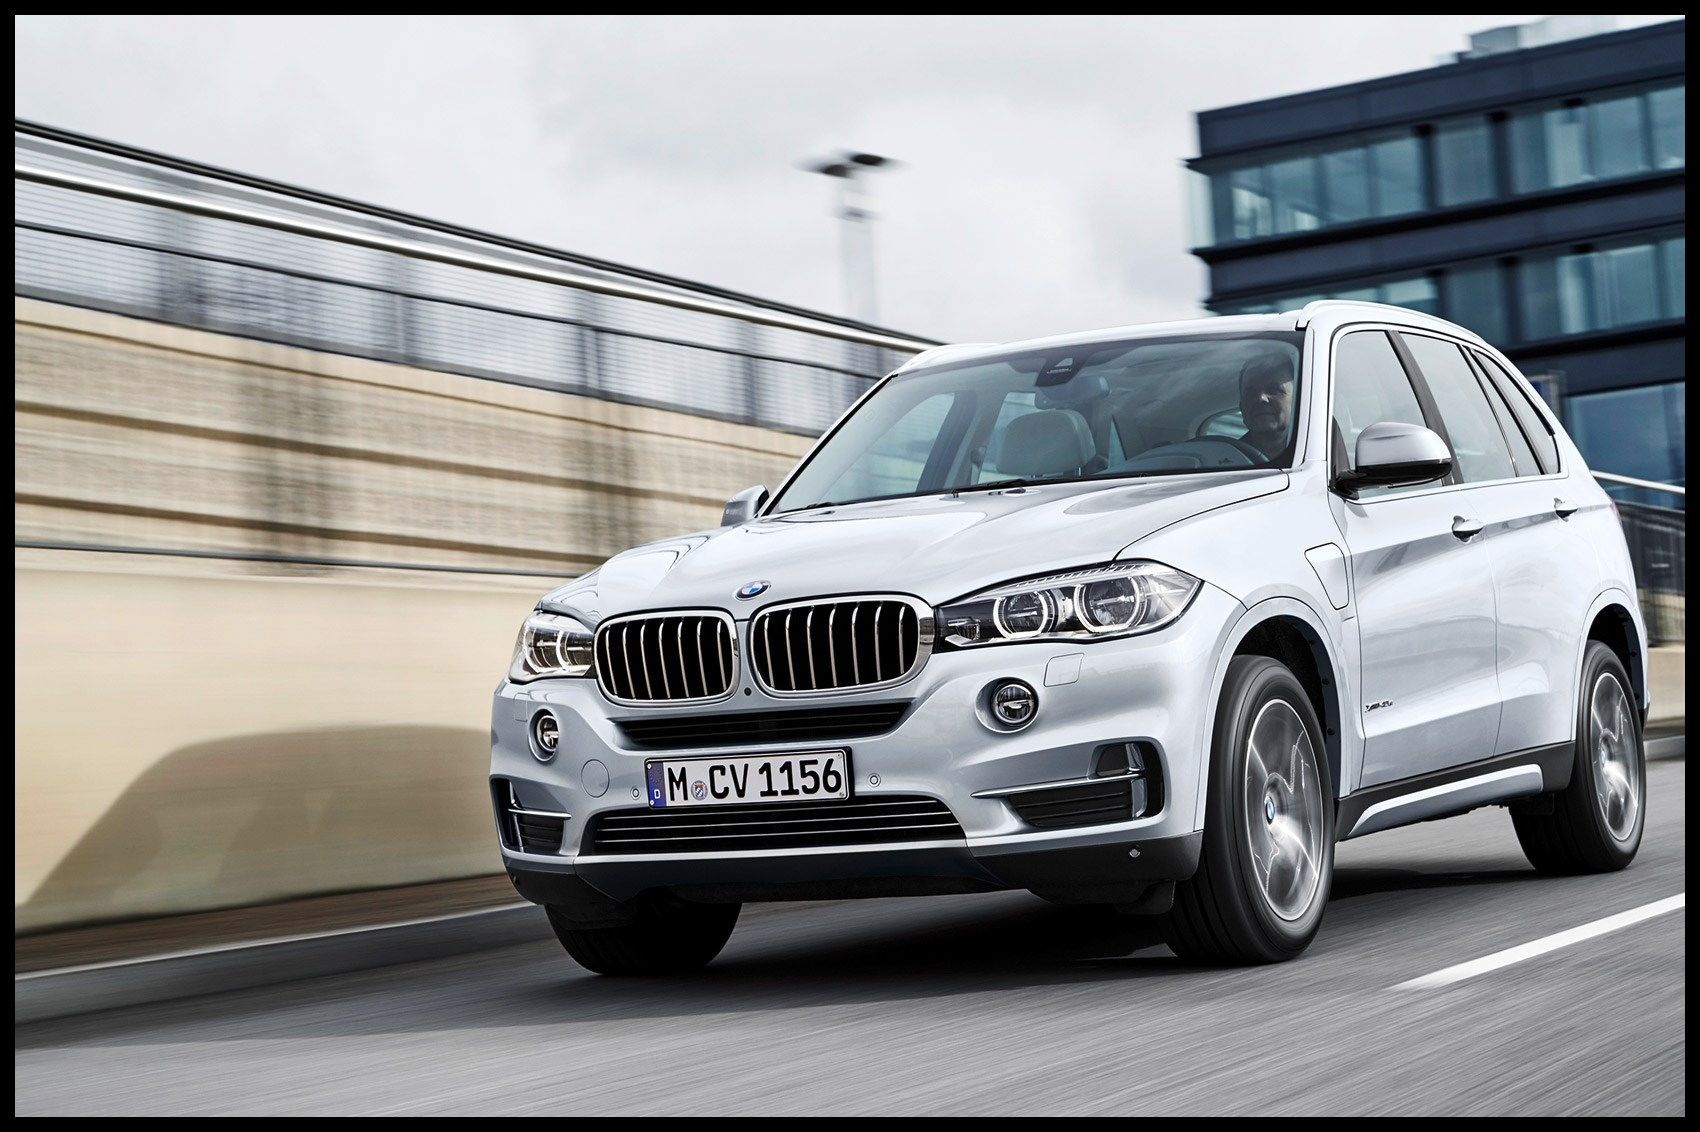 BMW X5 xDrive 40e first drive CAR June 2016